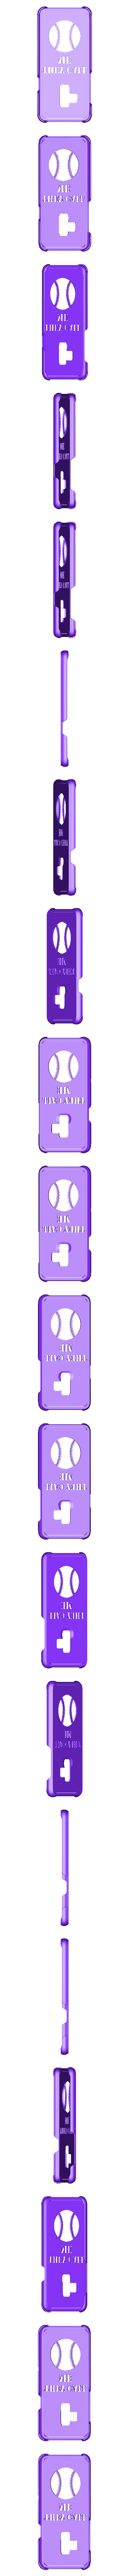 they_call_me_baseball_v2.stl Télécharger fichier STL gratuit Etui de téléphone Samsung Galaxy S9 Custom Baseball • Modèle à imprimer en 3D, mmjames